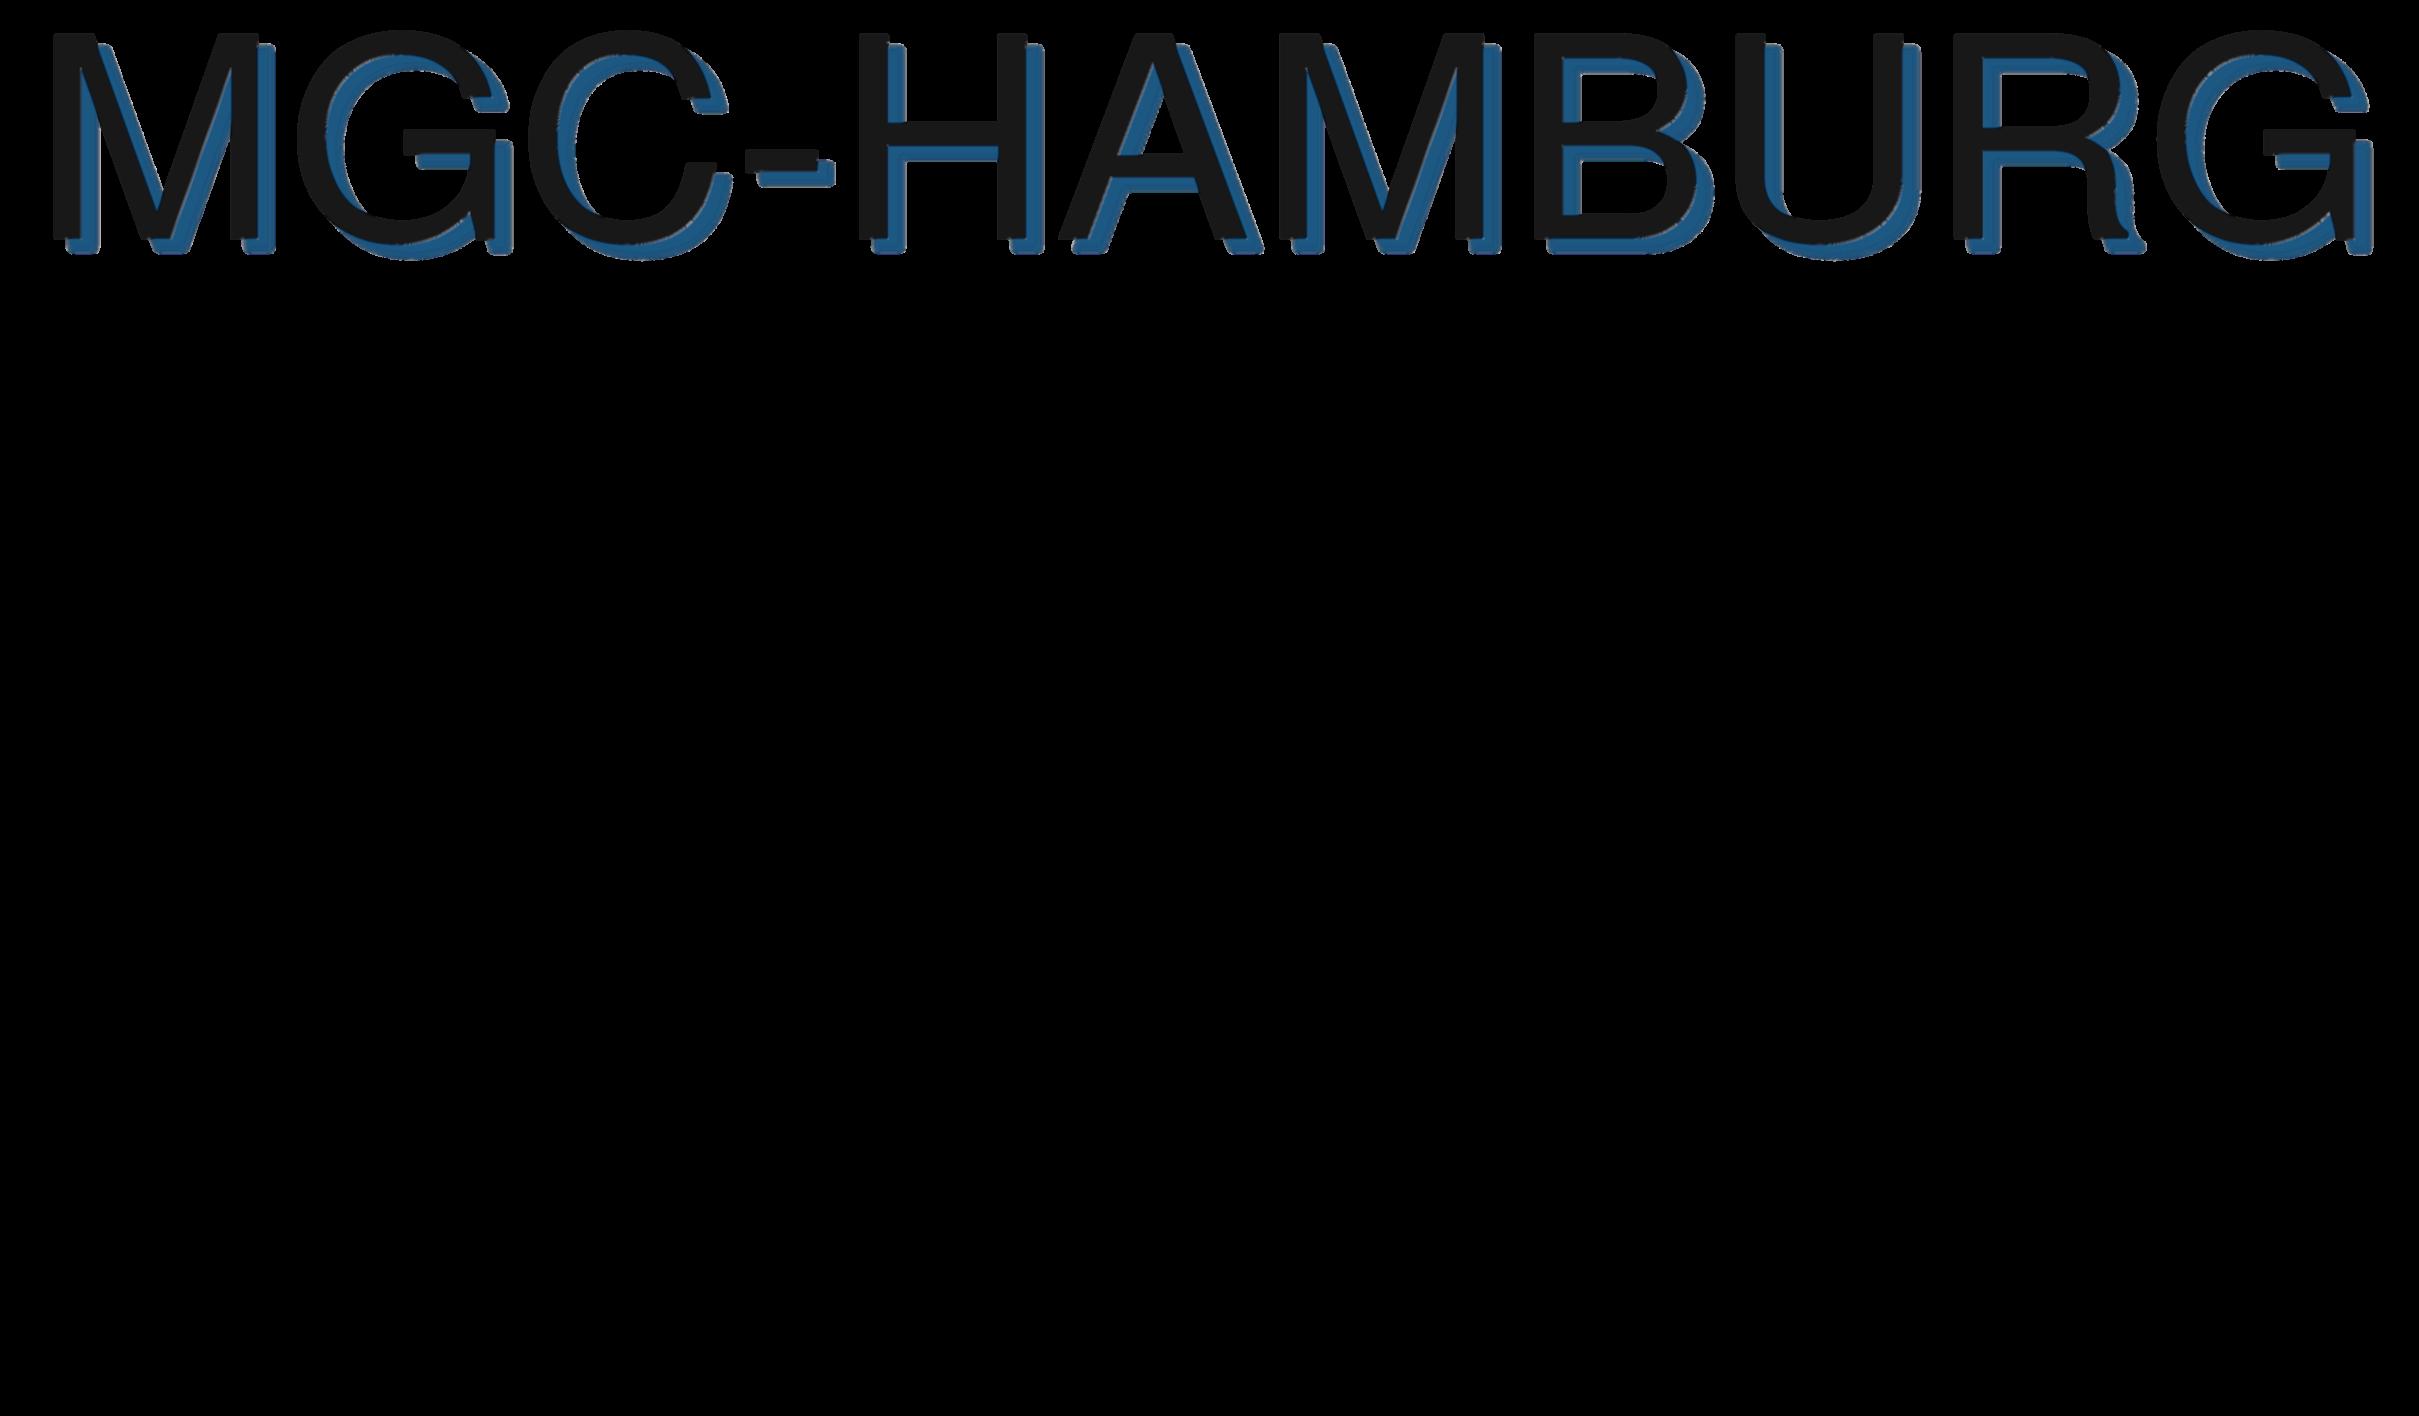 MGC-Hamburg